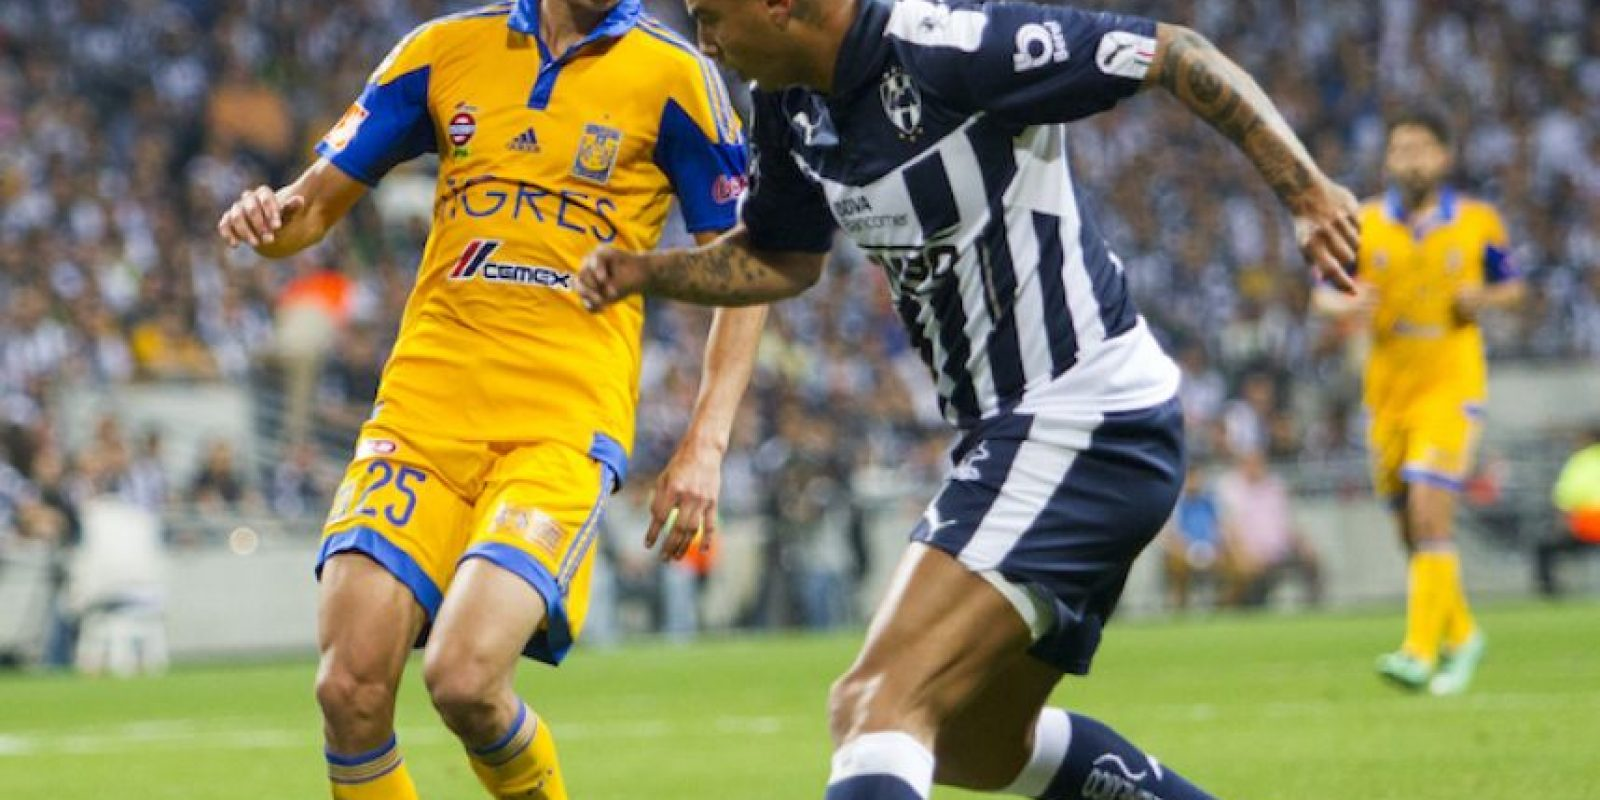 Monterrey vs Tigres Foto:Mexsport